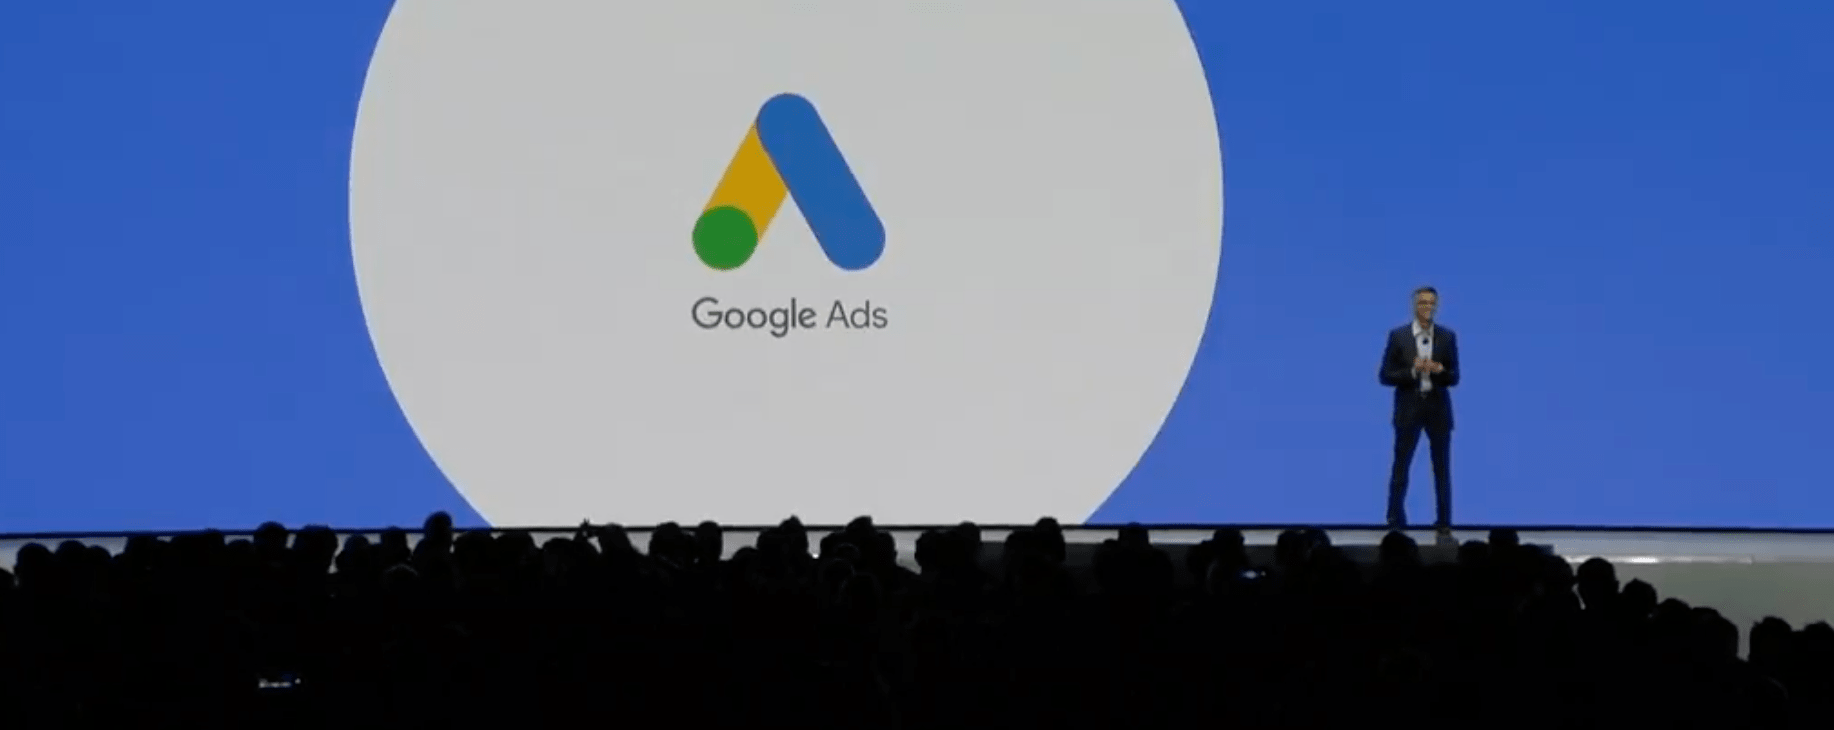 google marketing live 2018  get the latest google ads